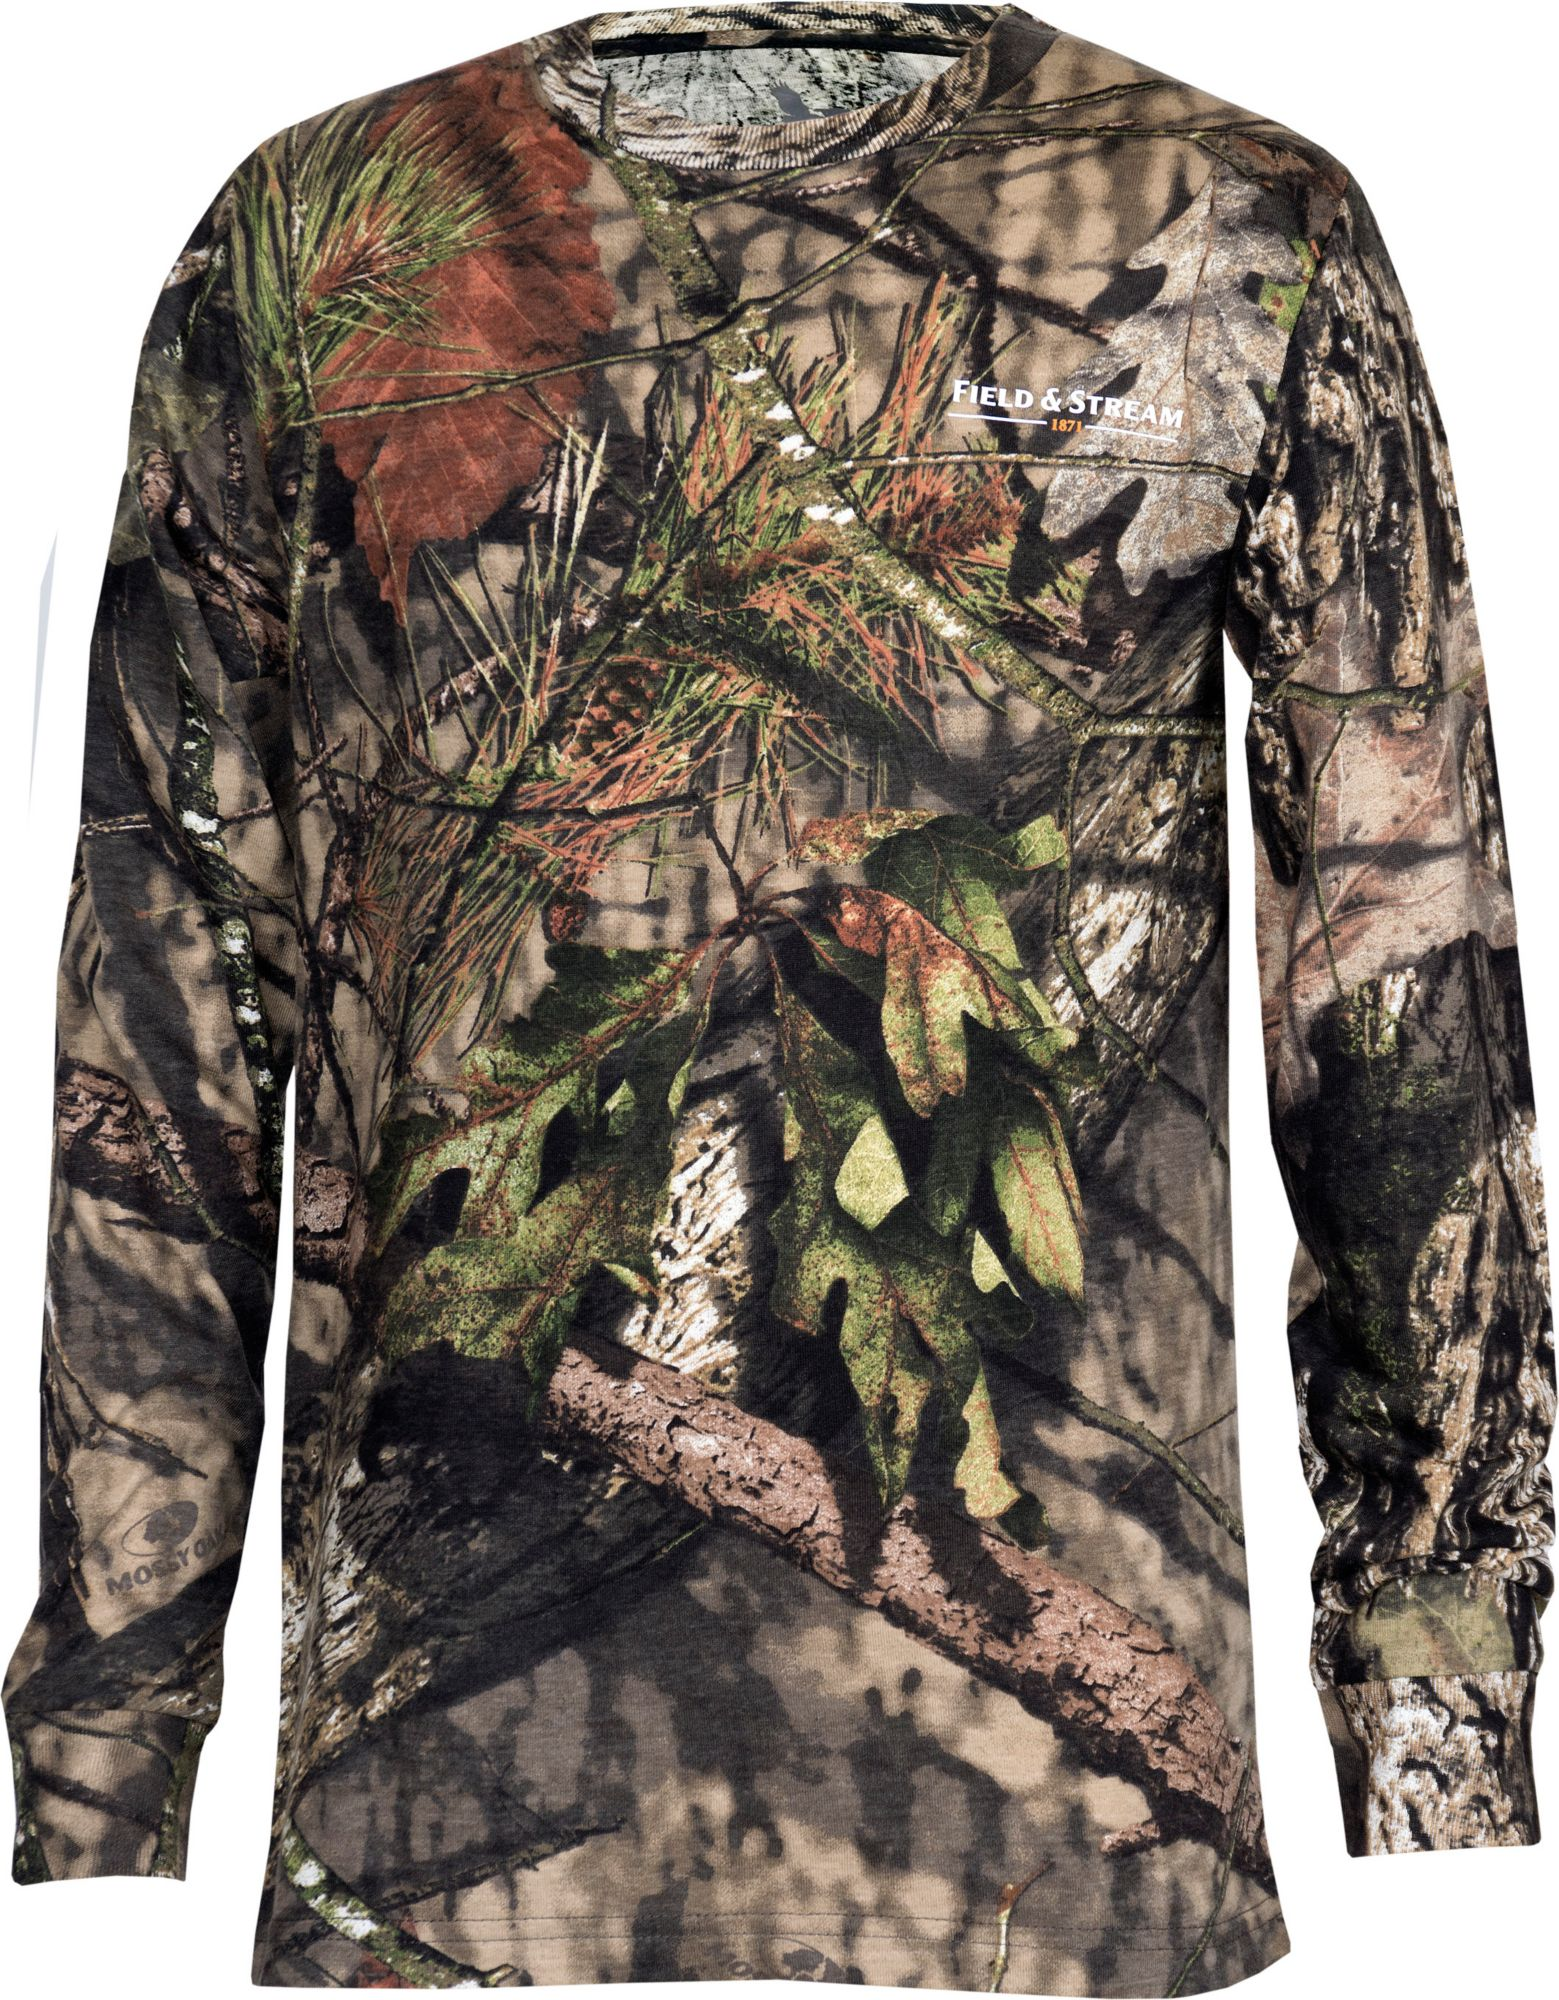 54dd9ebca67f5 Field & Stream Youth Long Sleeve Camo Shirt, Kids Unisex, Size: Large, Brown